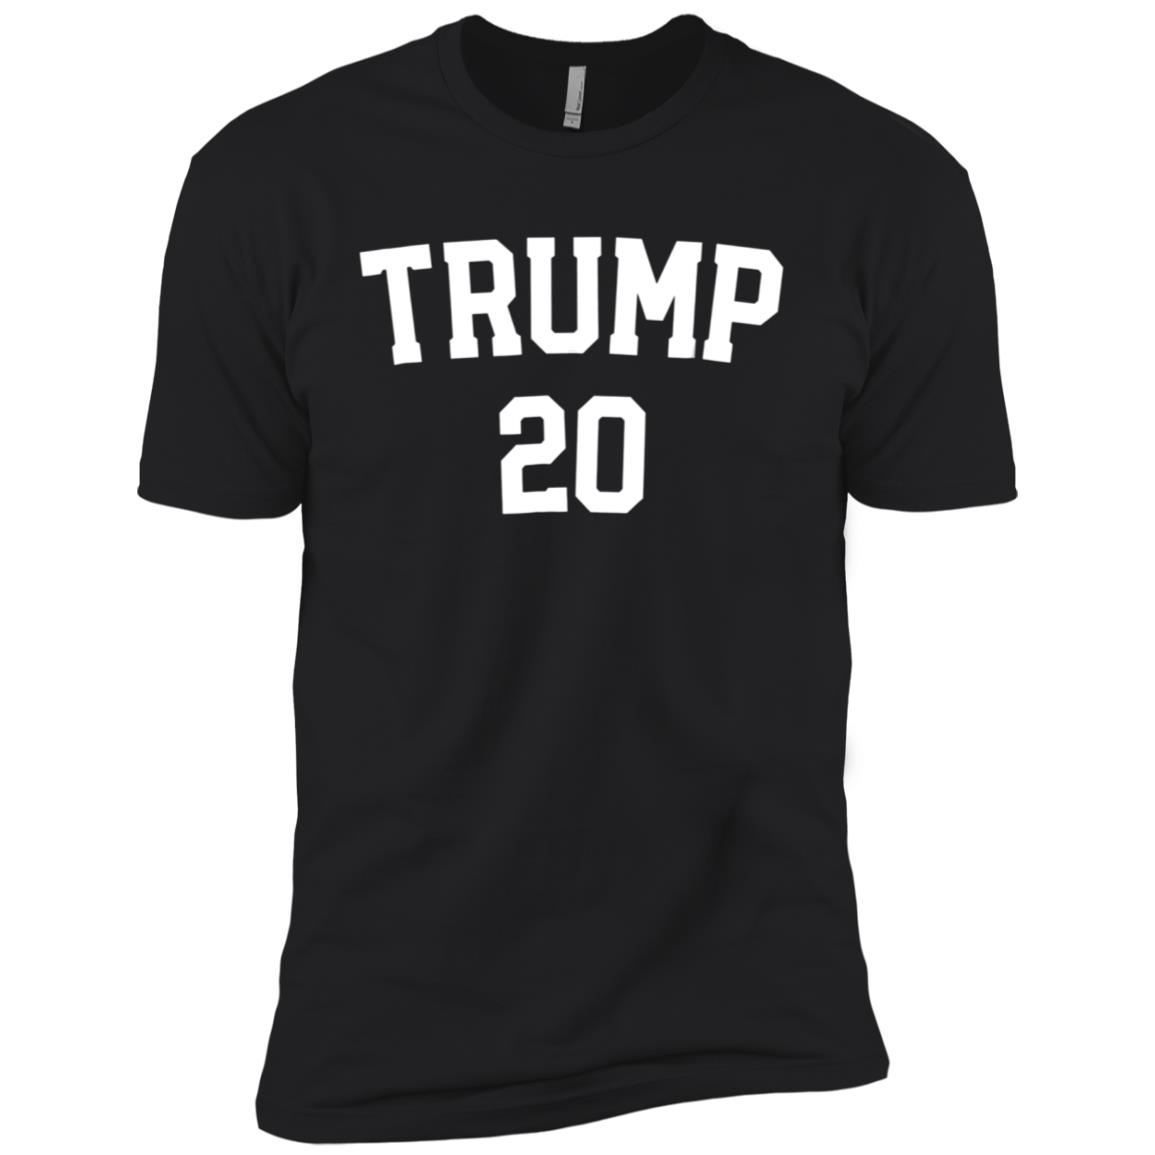 Trump 2020 Re-elect Make Usa Great Again Gop political Men Short Sleeve T-Shirt